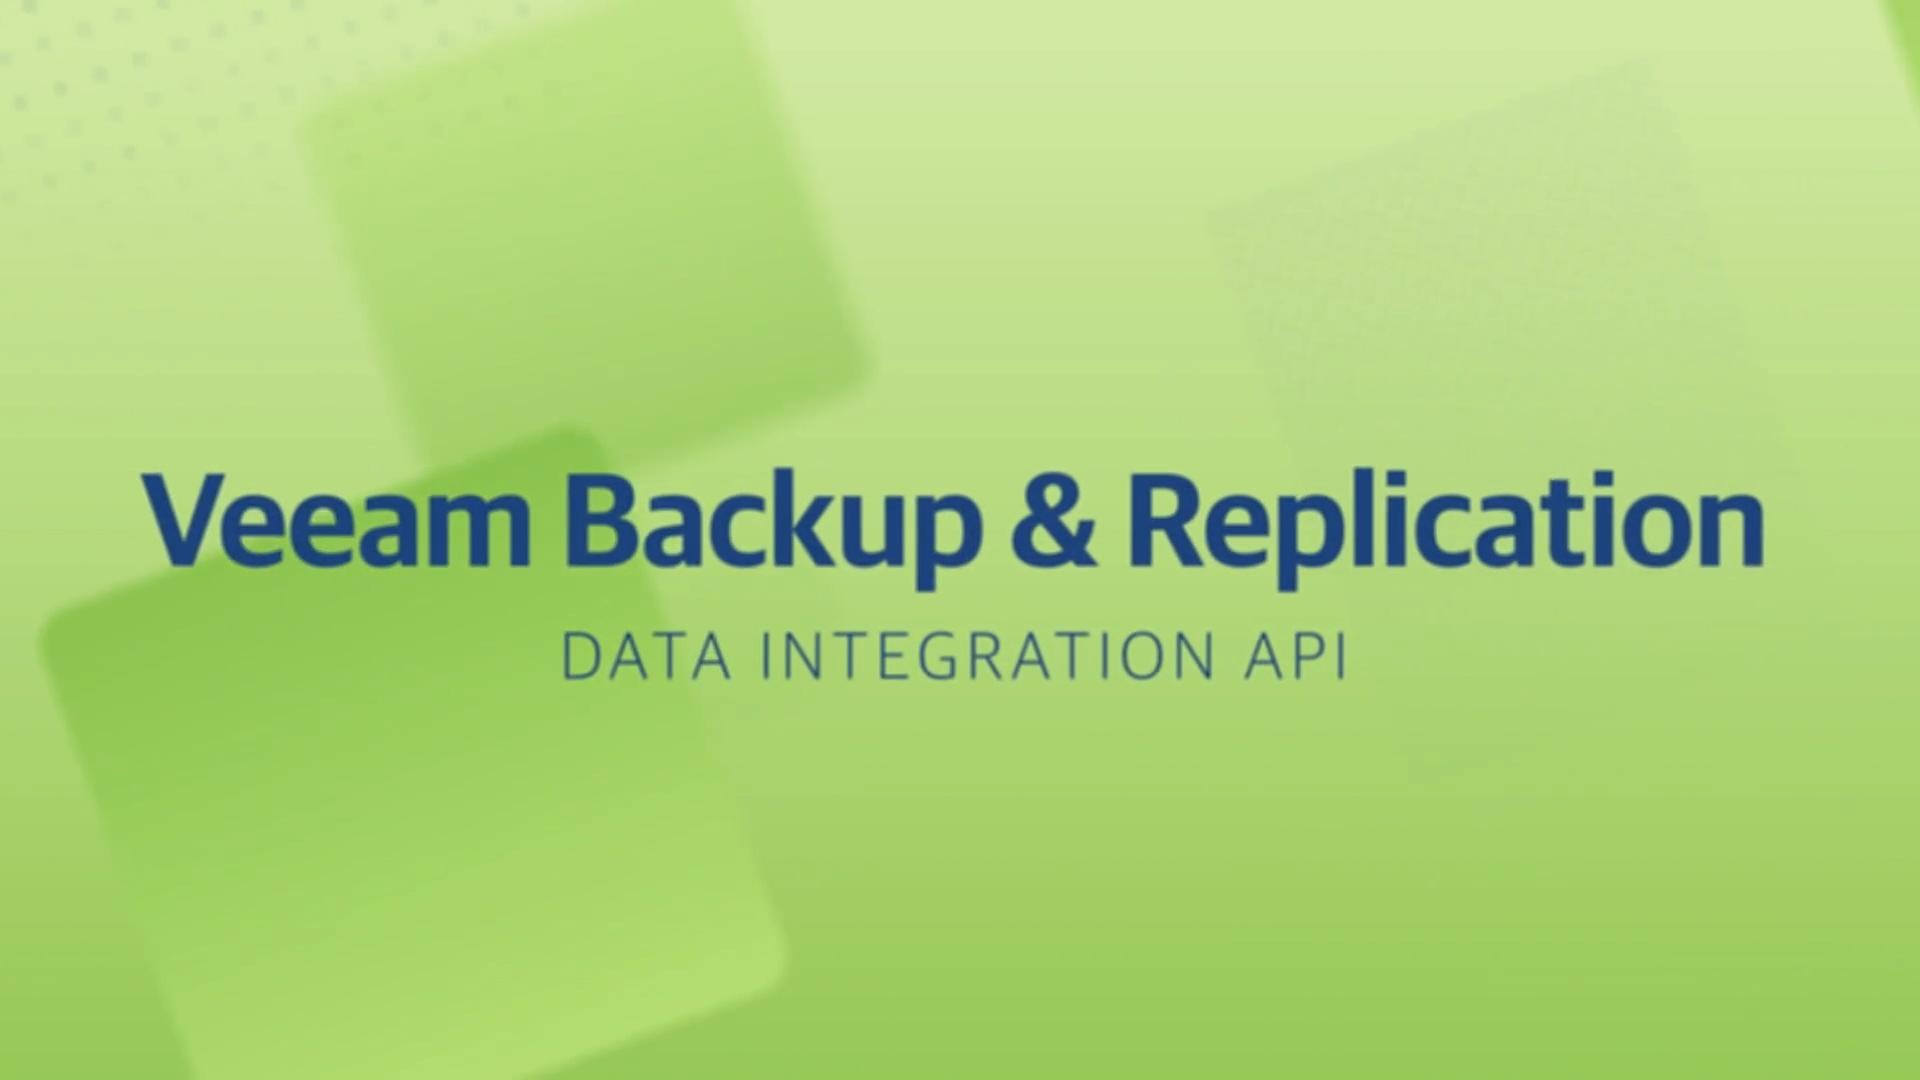 Product launch v11 - VBR - Data Integration API